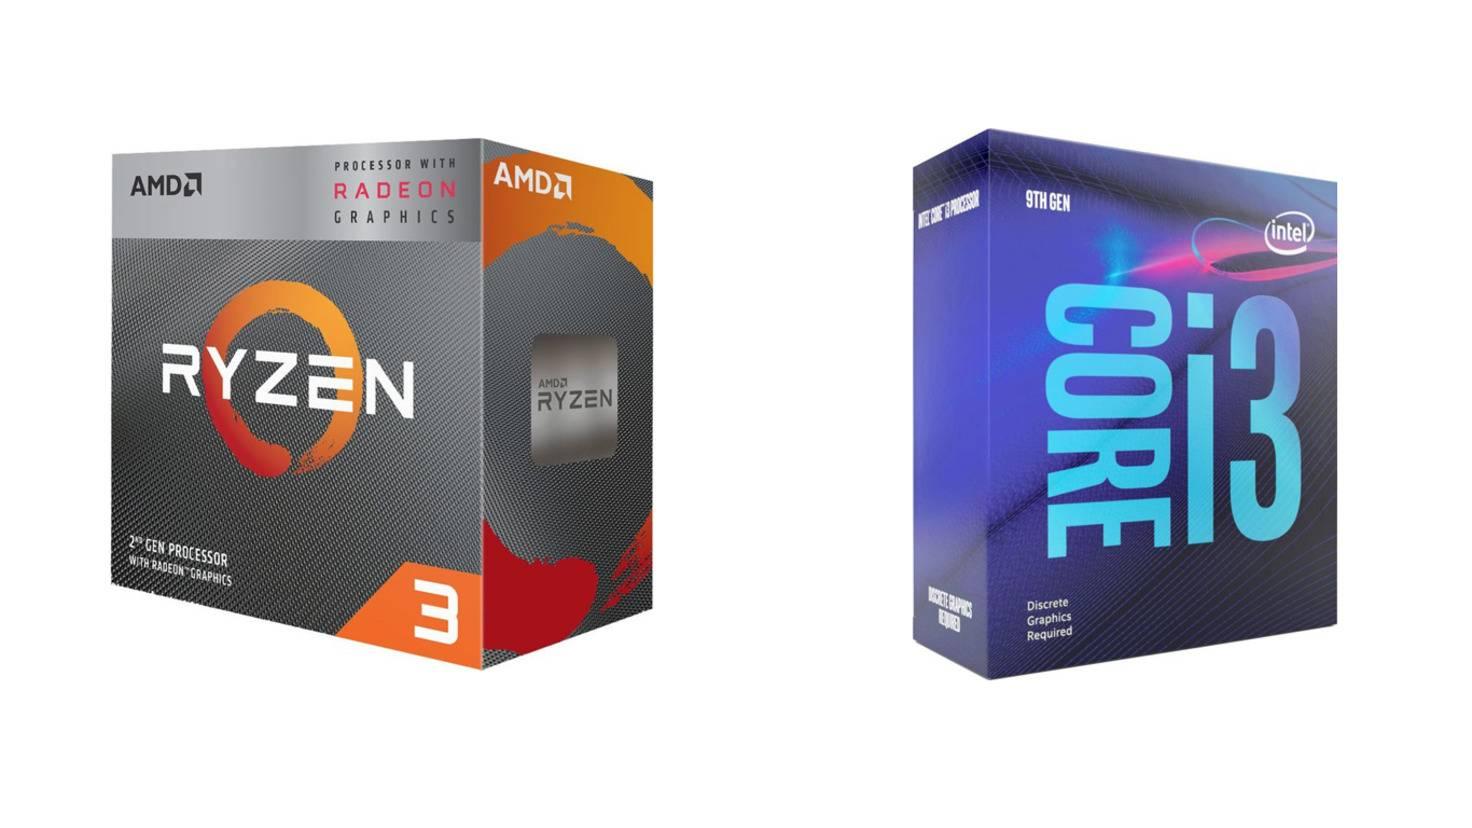 amd-ryzen-3200g-intel-core-i3-9100f